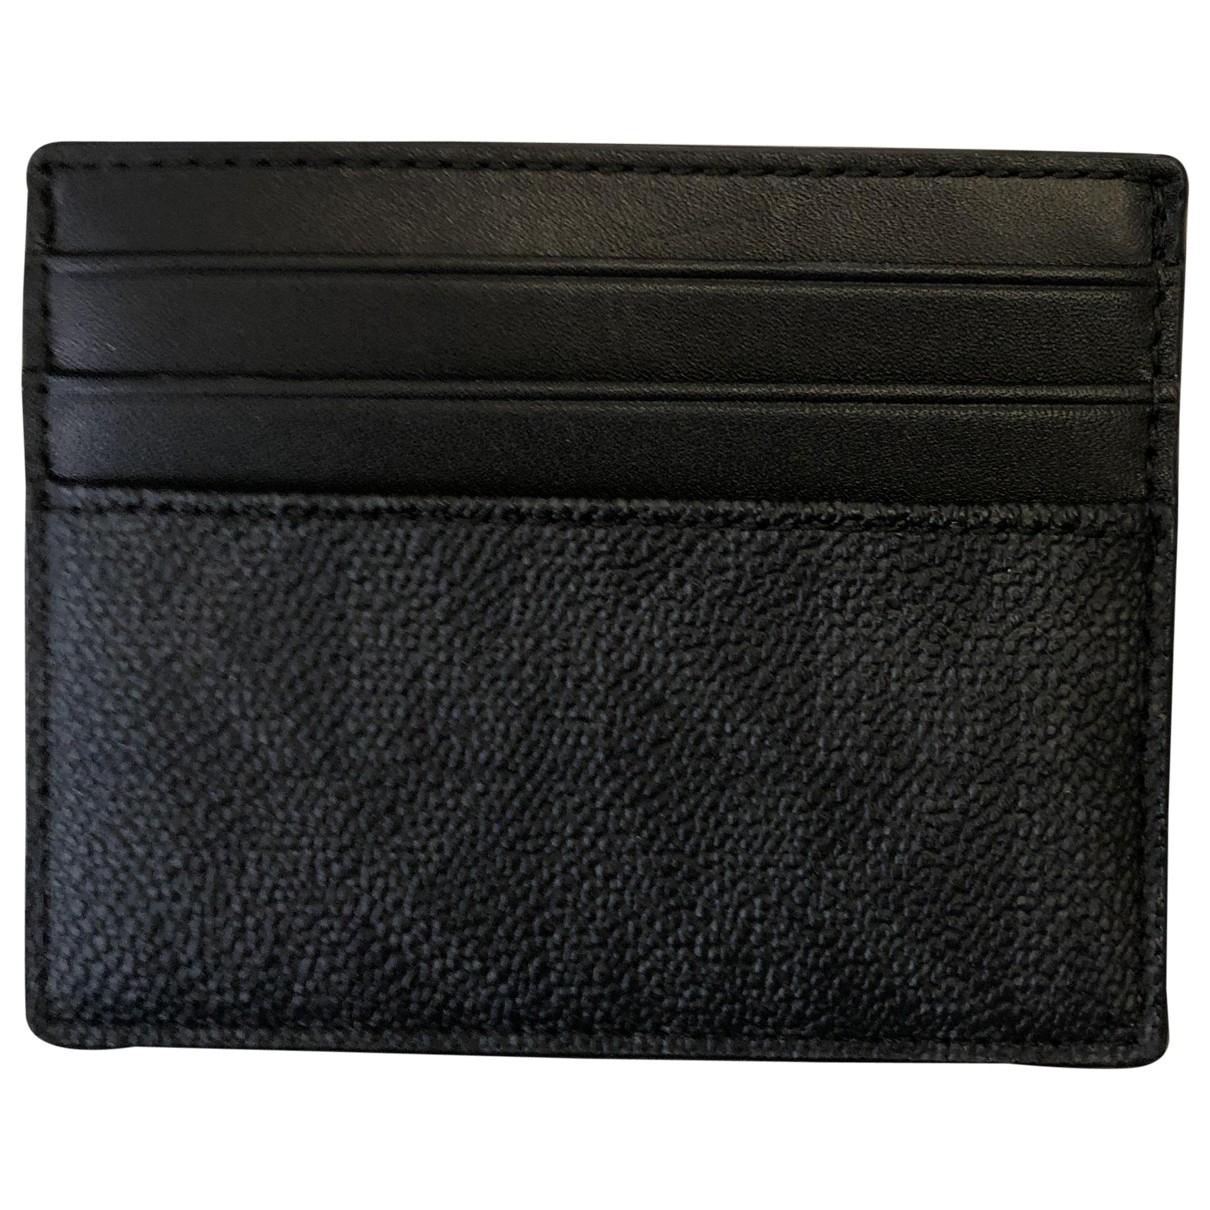 Michael Kors \N Black Small bag, wallet & cases for Men \N